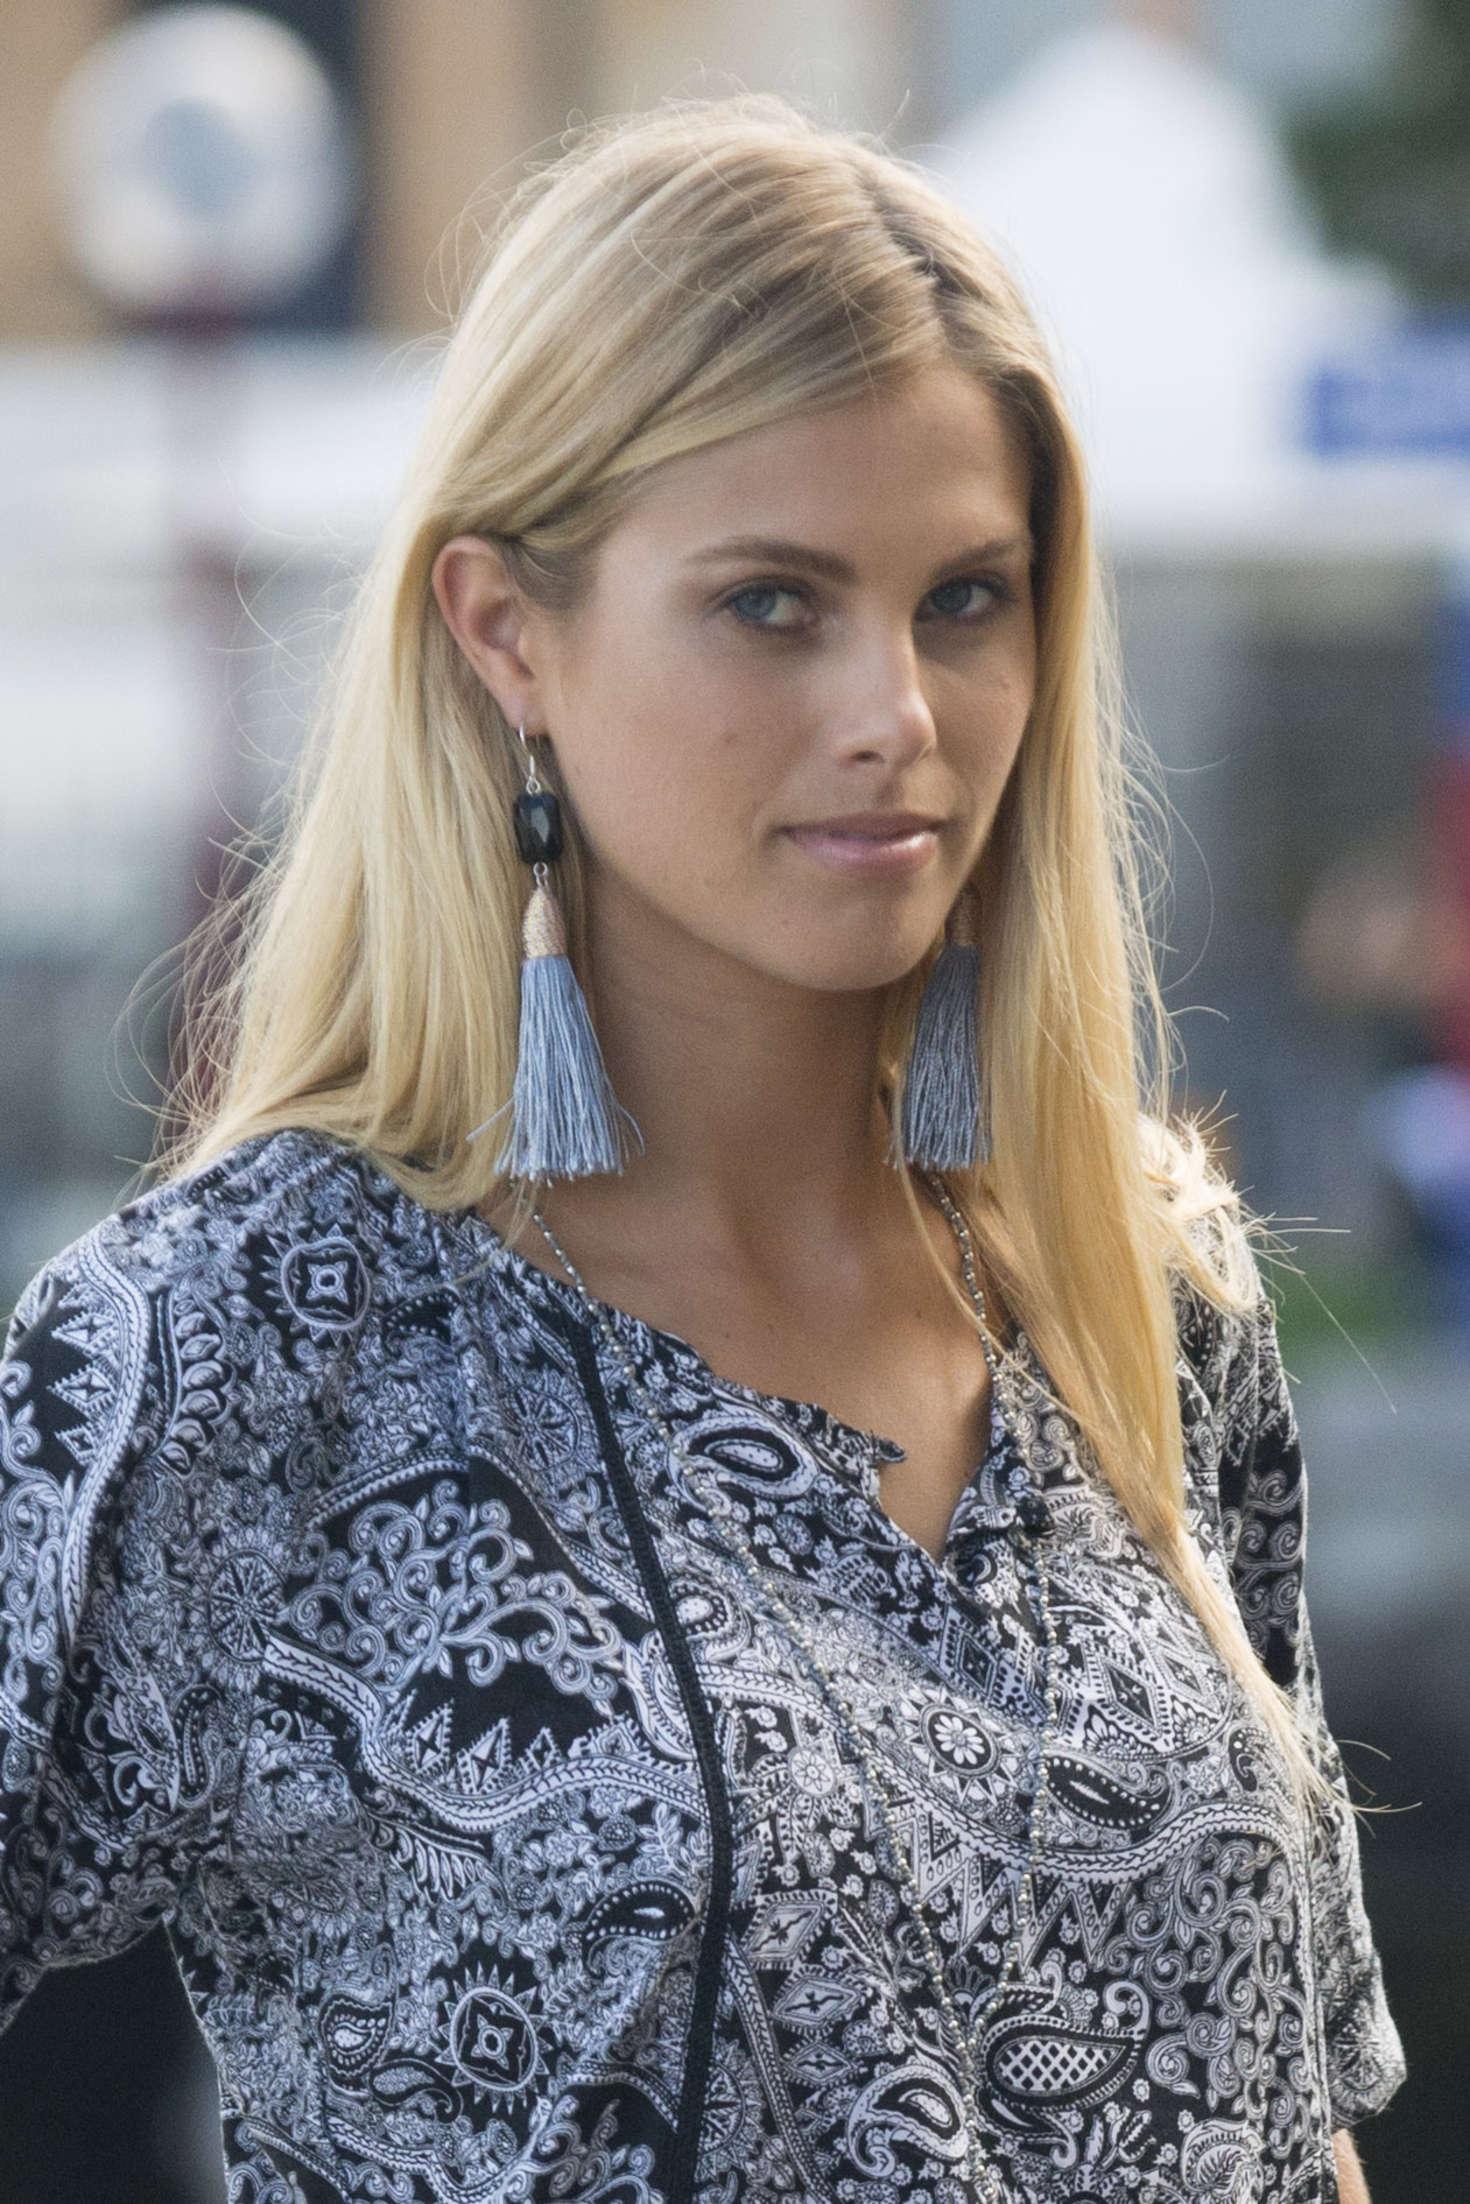 Natalie Roser on Photoshoot in Sydney -03 - GotCeleb